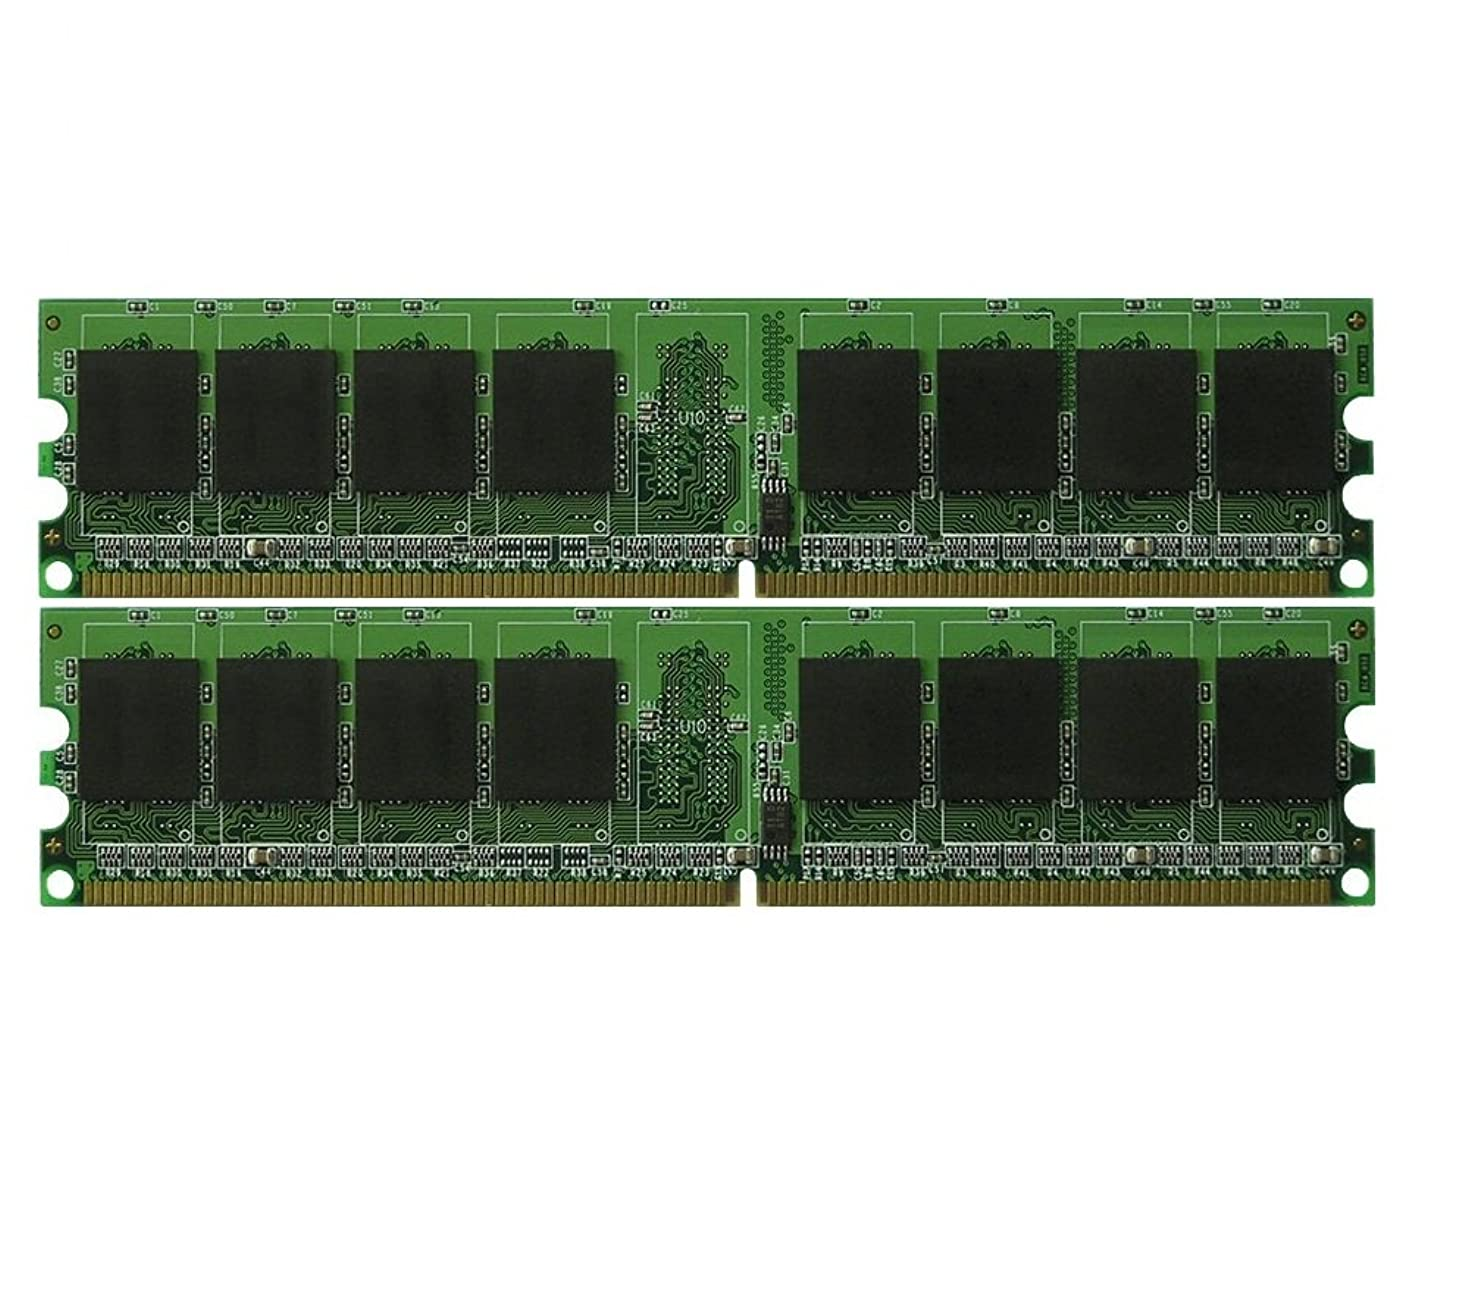 1GB SODIMM Toshiba Satellite A135-S2246 A135-S2256 A135-S2266 Ram Memory